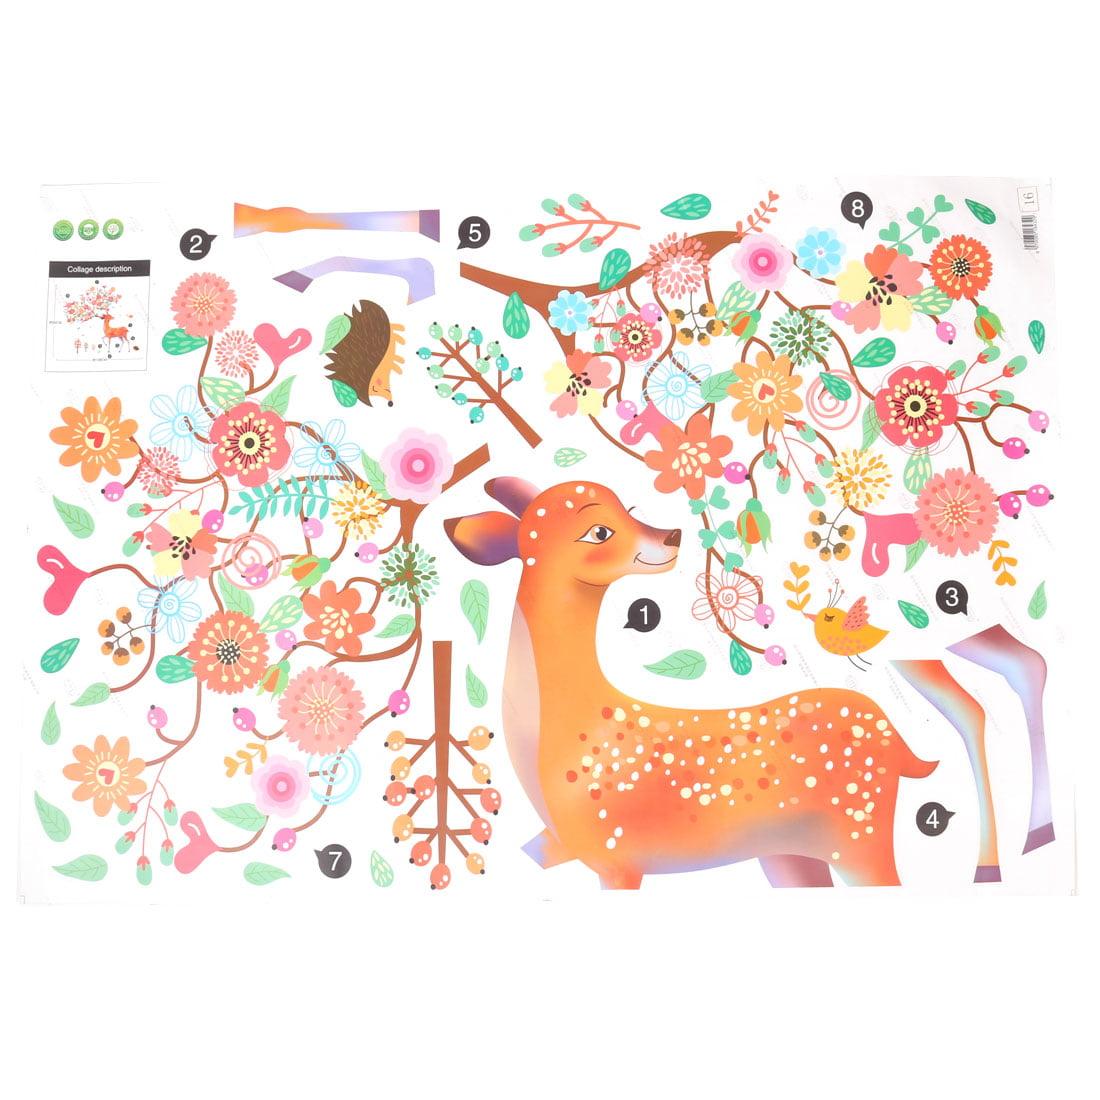 Room PVC Deer Pattern Self-adhesive Window Film Wall Sticker Decal Multicolor - image 1 of 3